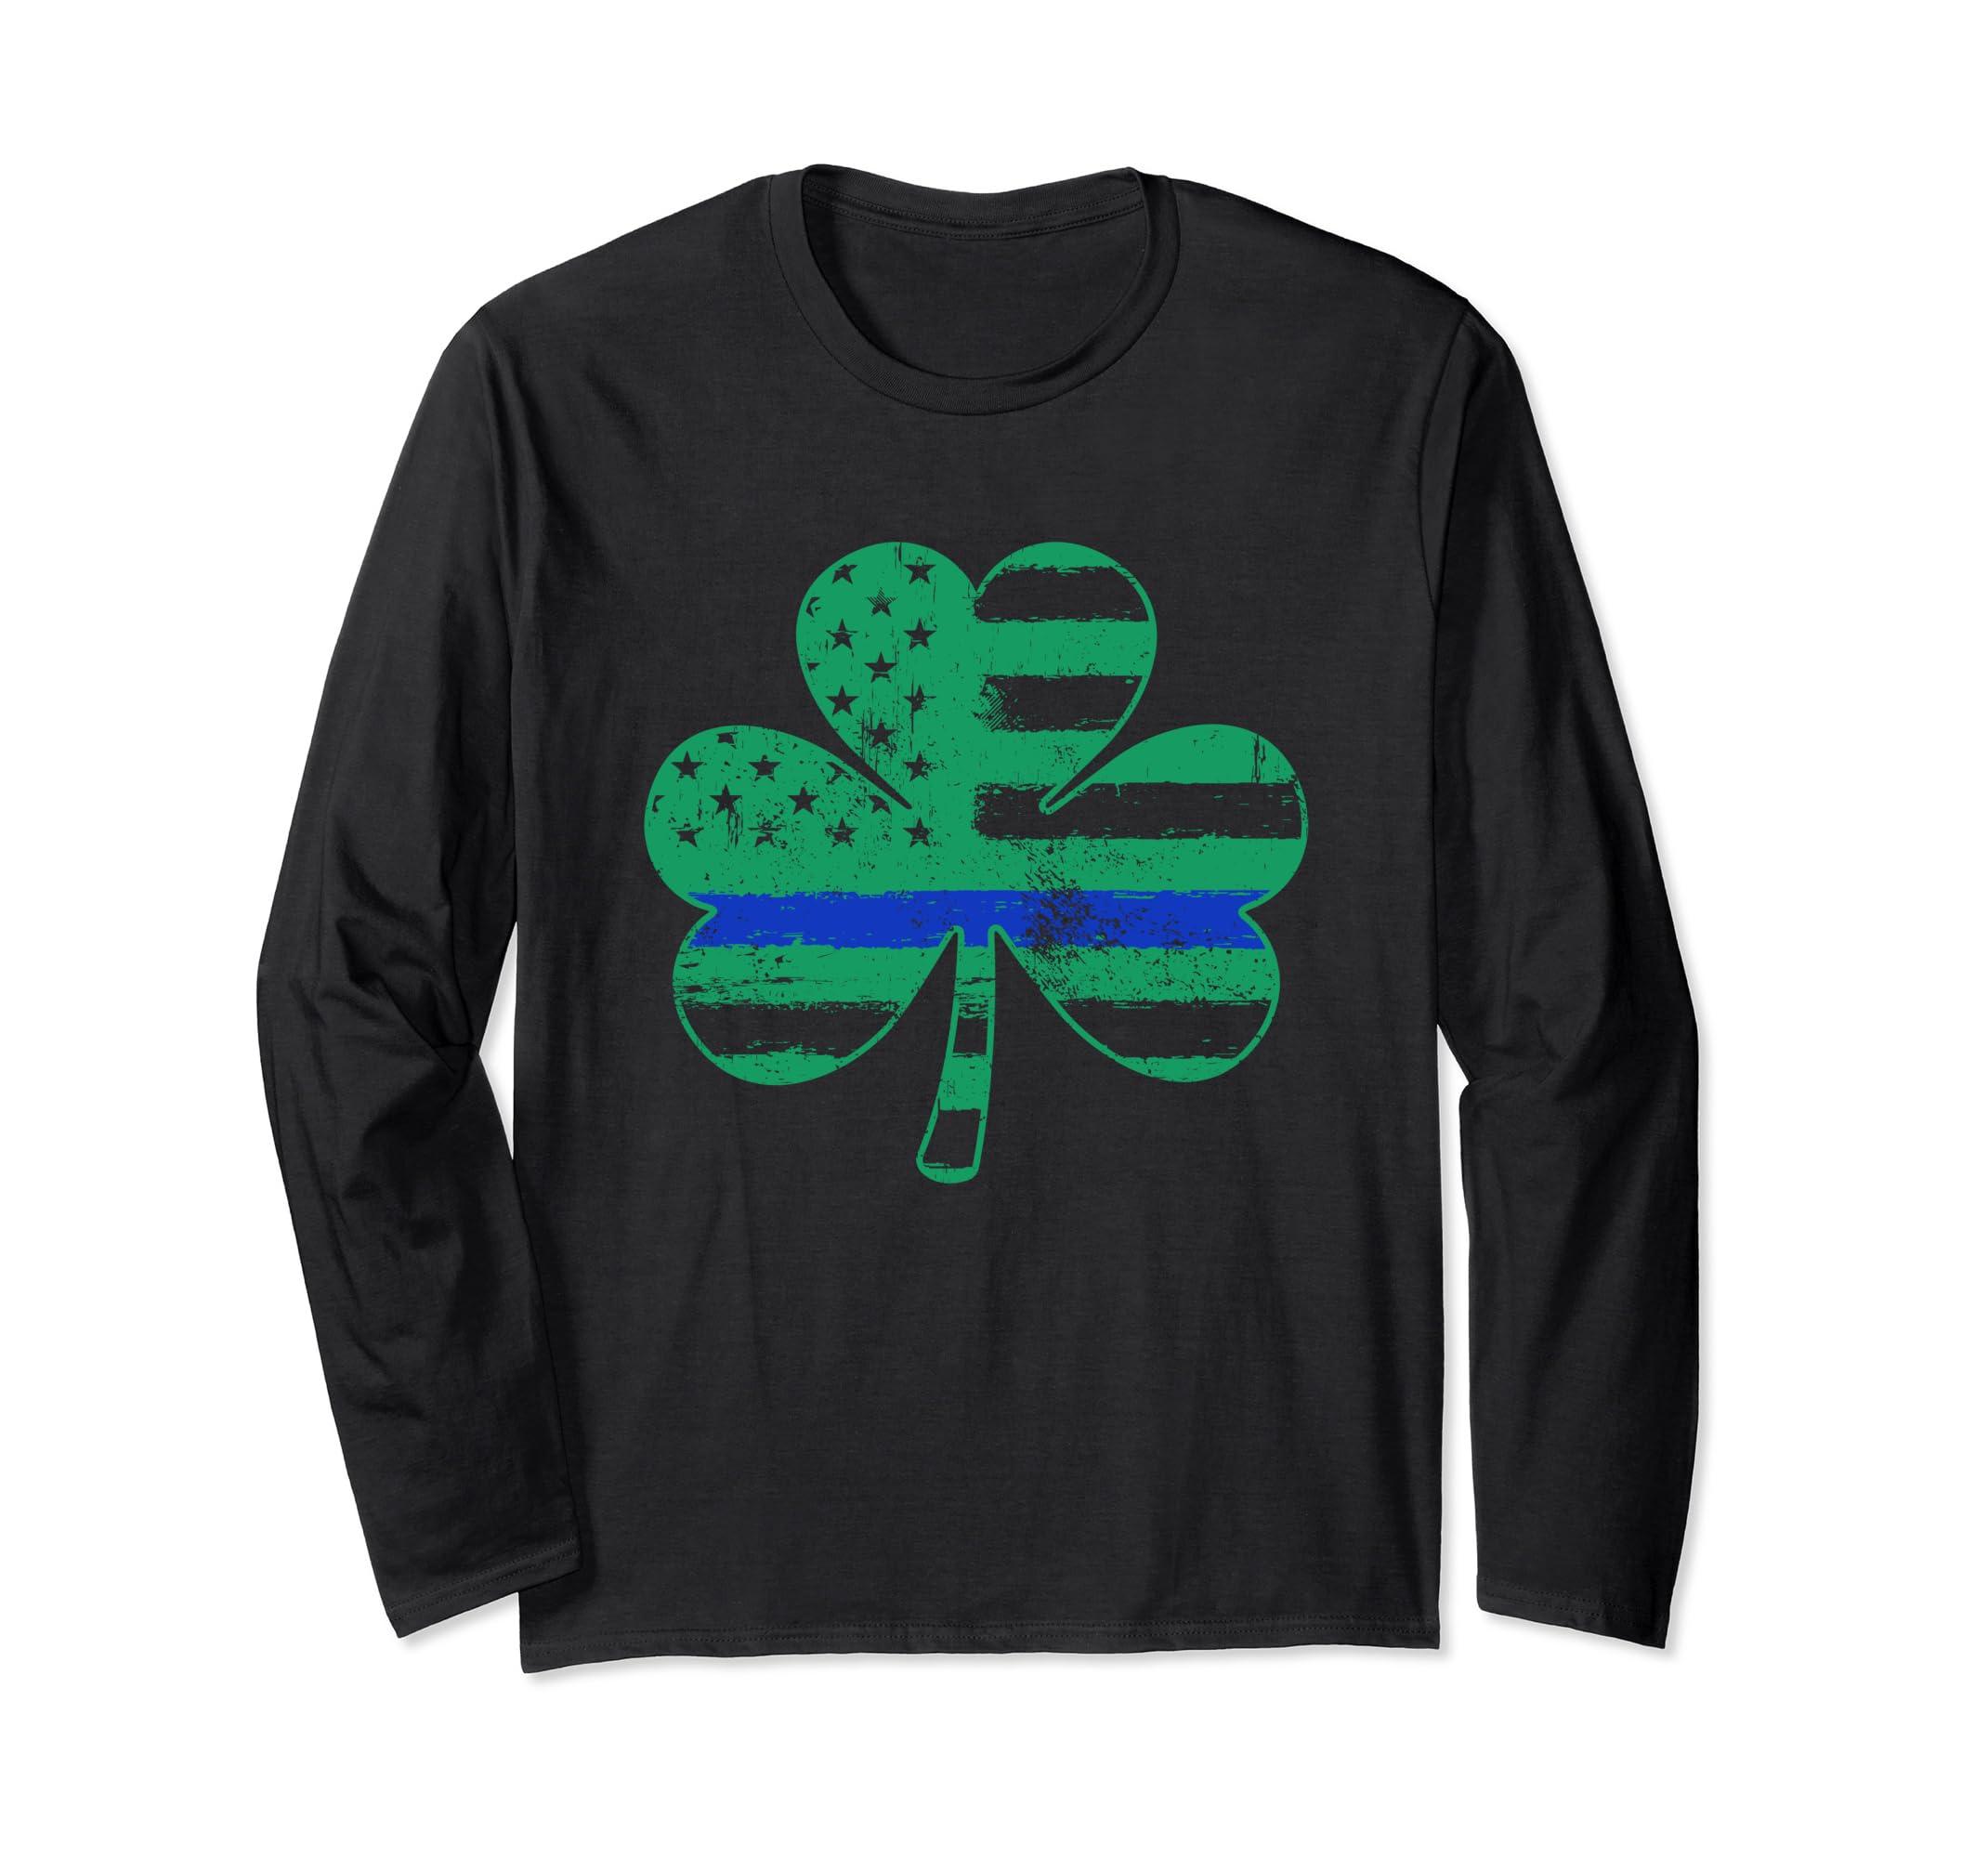 Thin Blue Line Long Sleeve St Patricks Day Shirt – Shamrock-Teehay